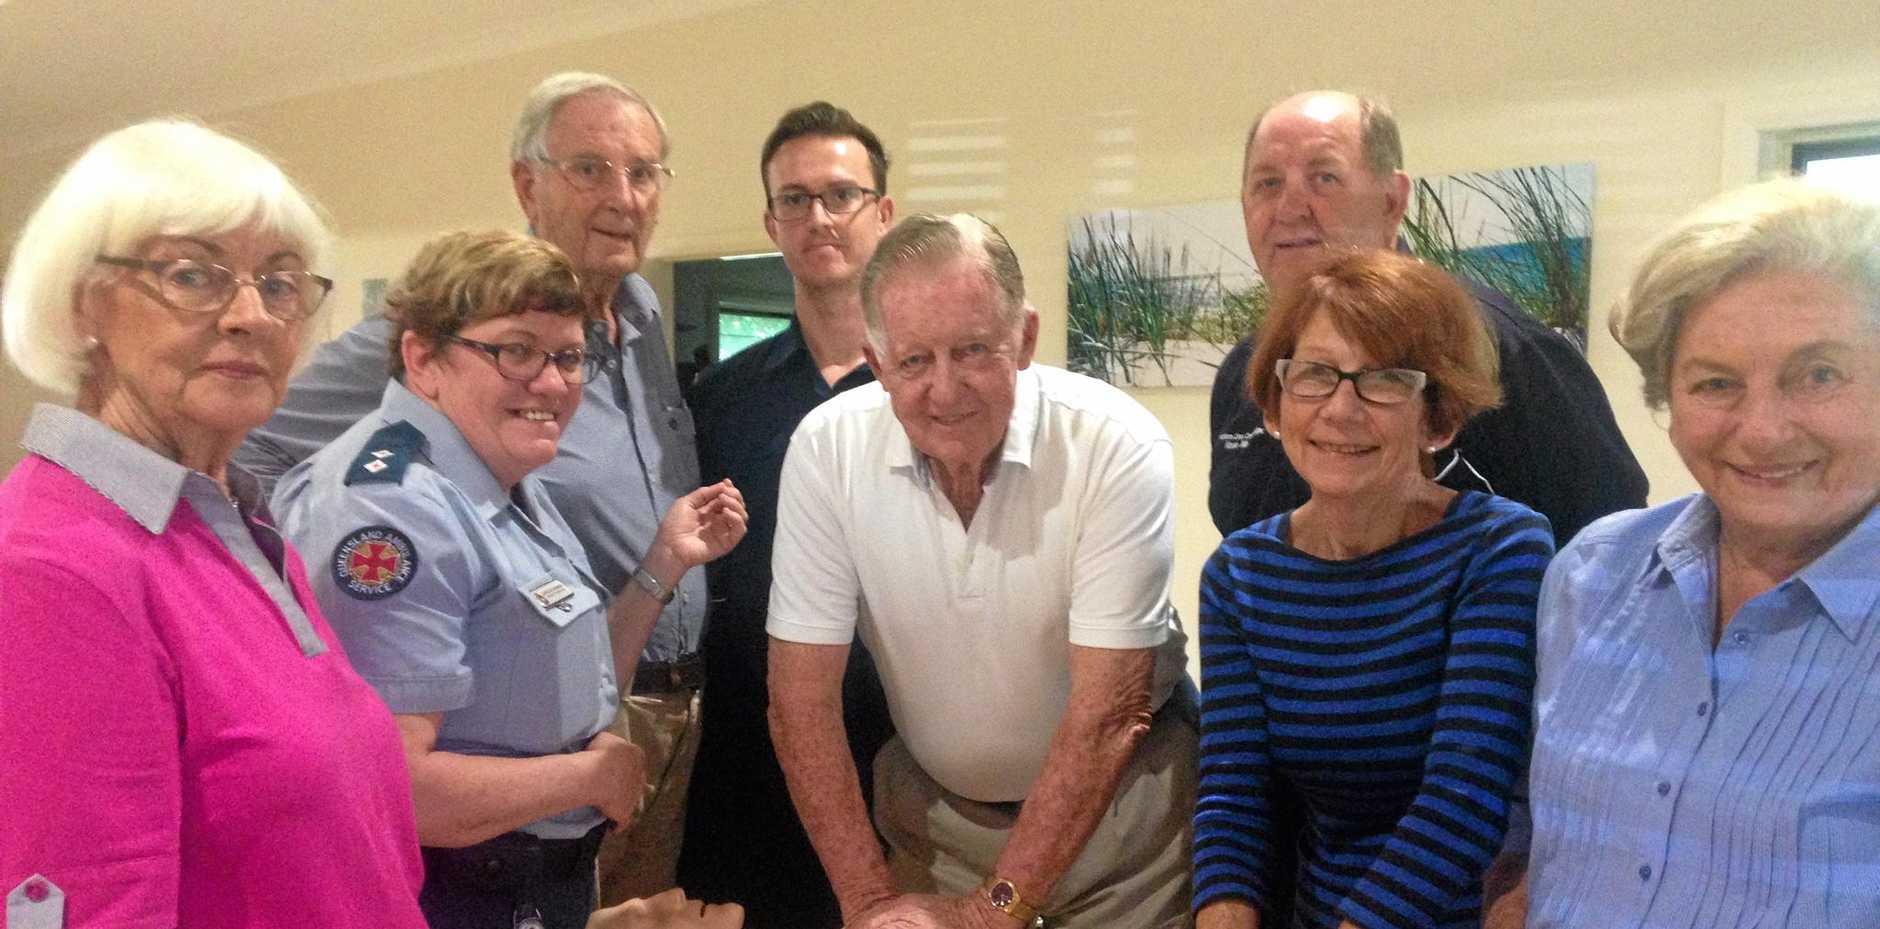 CPR AWARE: Polly Messner, Annette Morris (QAS), Peter Messner, Stephen Kelly (trainer), Ken Earner, Roy Crombie , Rosemary Dwyer and Carmel Earner at Noosa Waters Retirement Village.